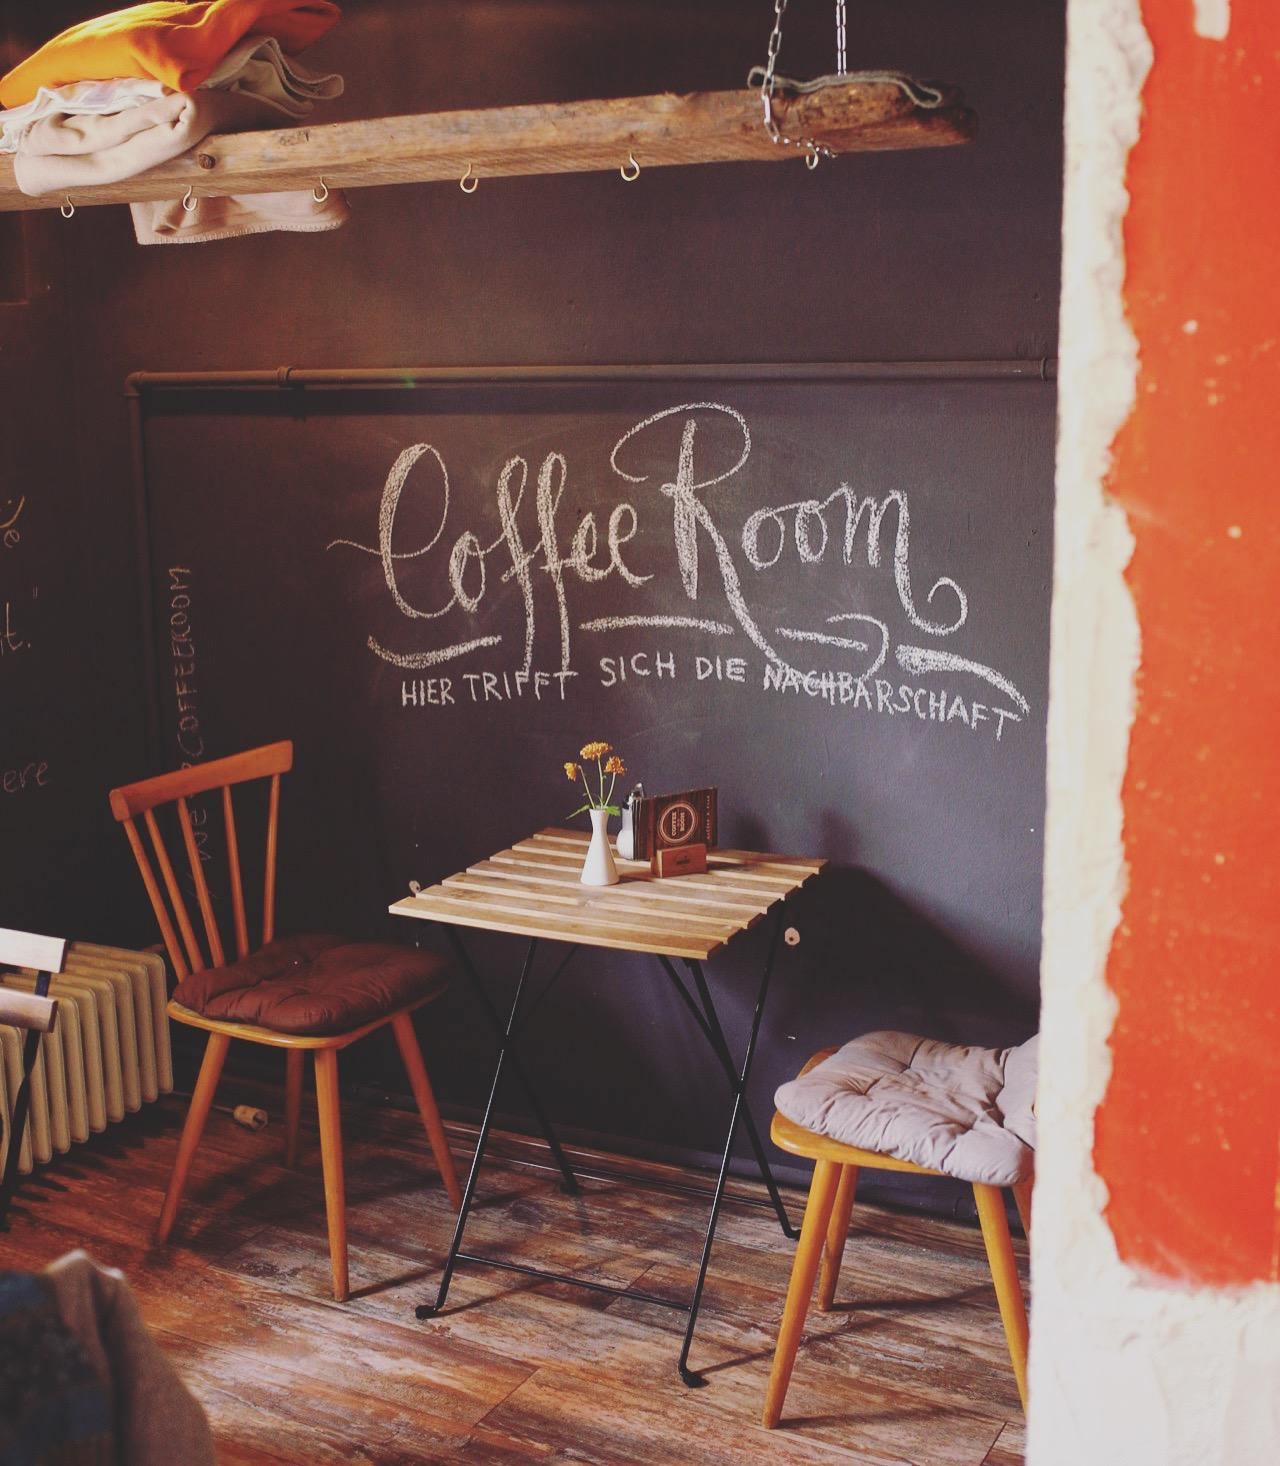 Lifestyle im Coffee Room Konstanz